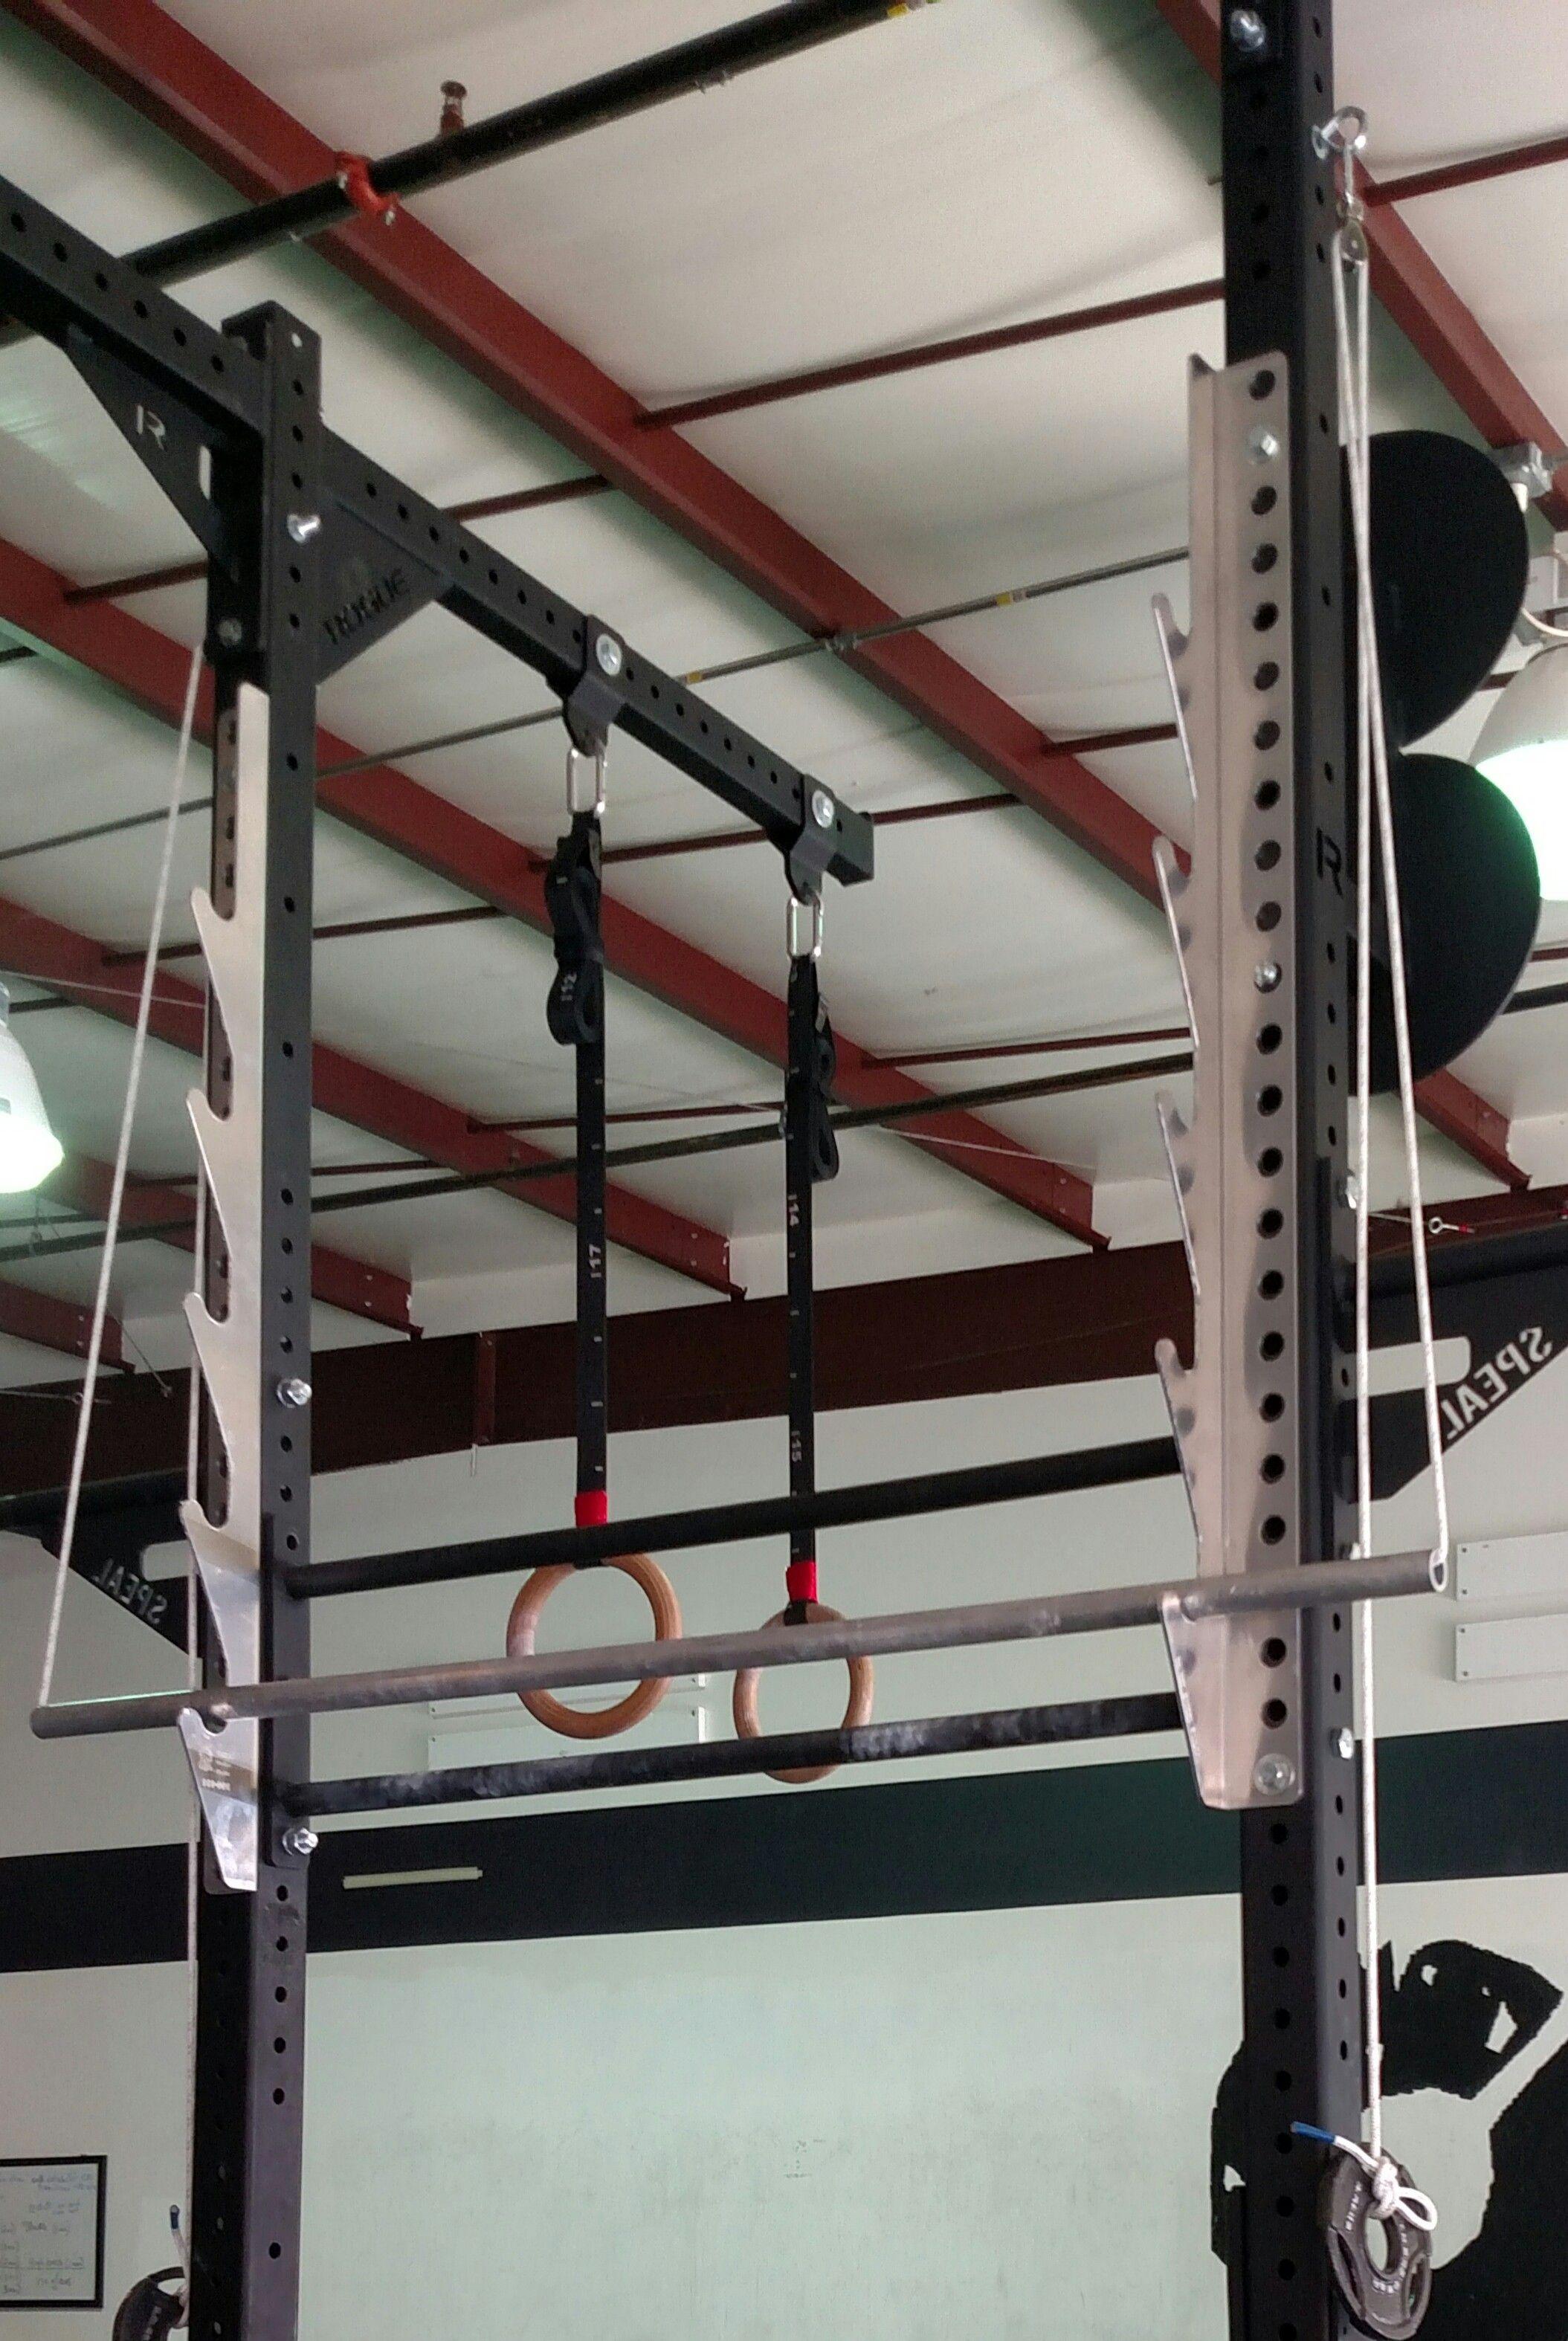 Aluminum salmon ladder pole ninja sports products ladder indoor